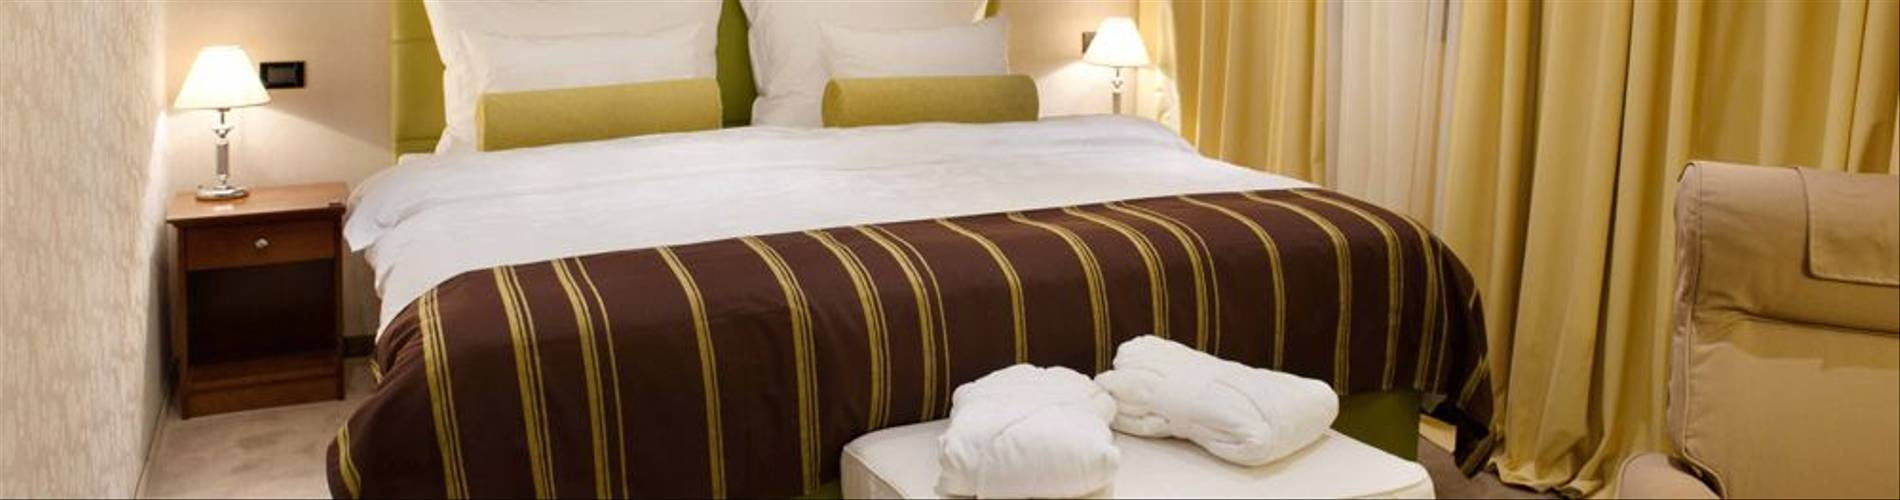 De-Luxe-double-room-Hotel-Dubrovnik-Zagreb.jpg